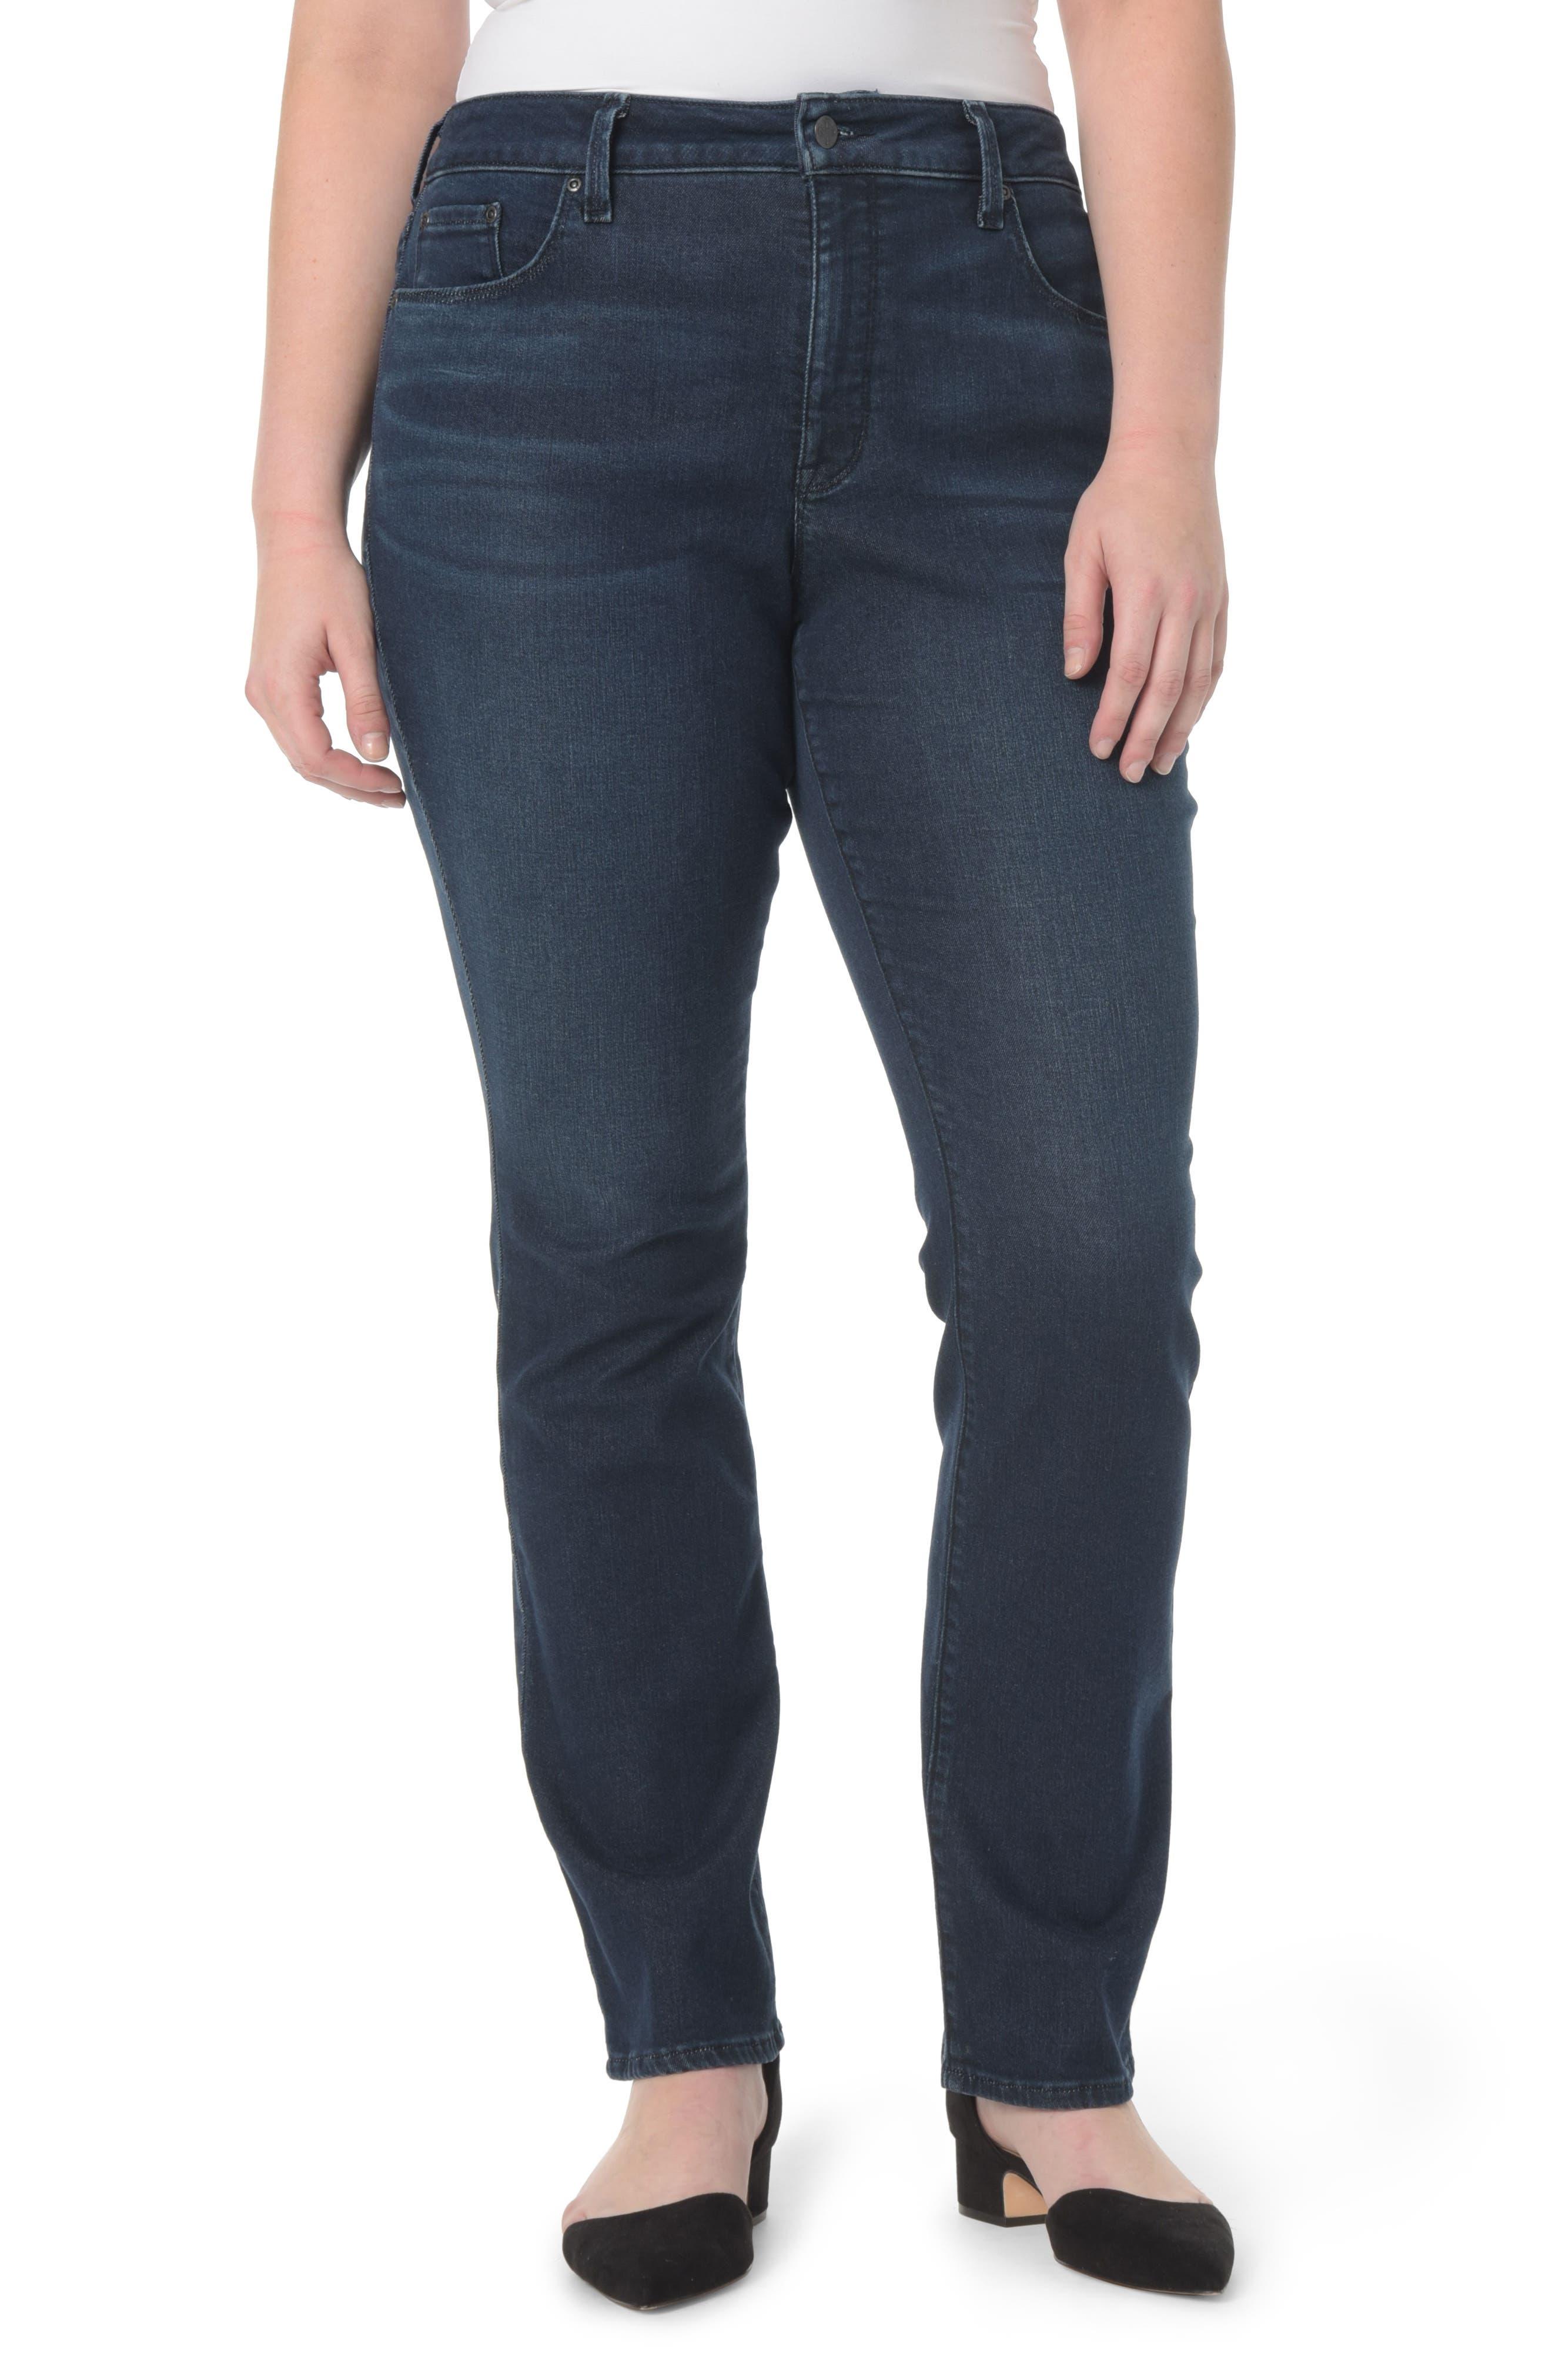 Alternate Image 1 Selected - NYDJ Marilyn Stretch Straight Leg Jeans (Morgan) (Plus Size)